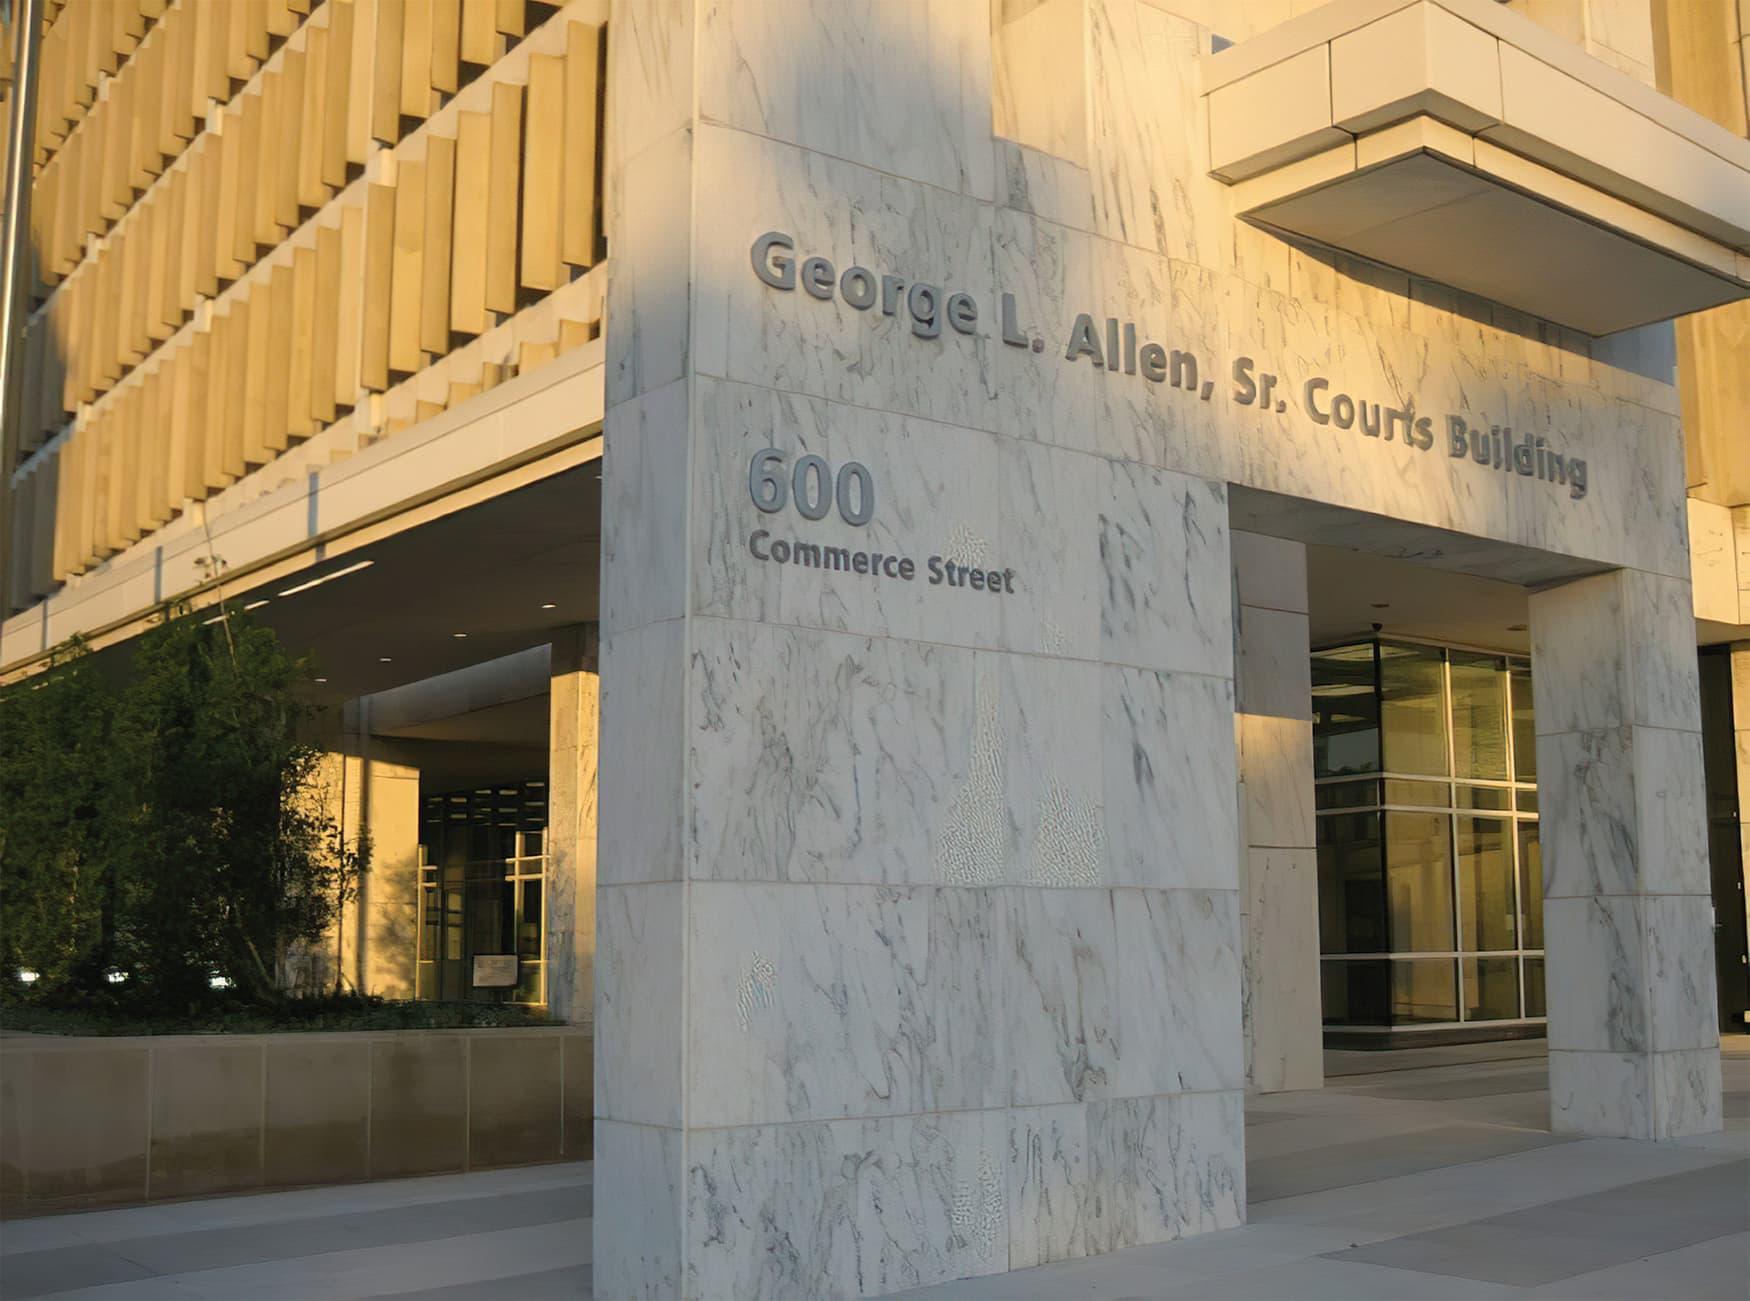 George L. Allen Sr. Courts Building. Civic Design, Workplace Design. Dallas, Texas. Fascia Signage.